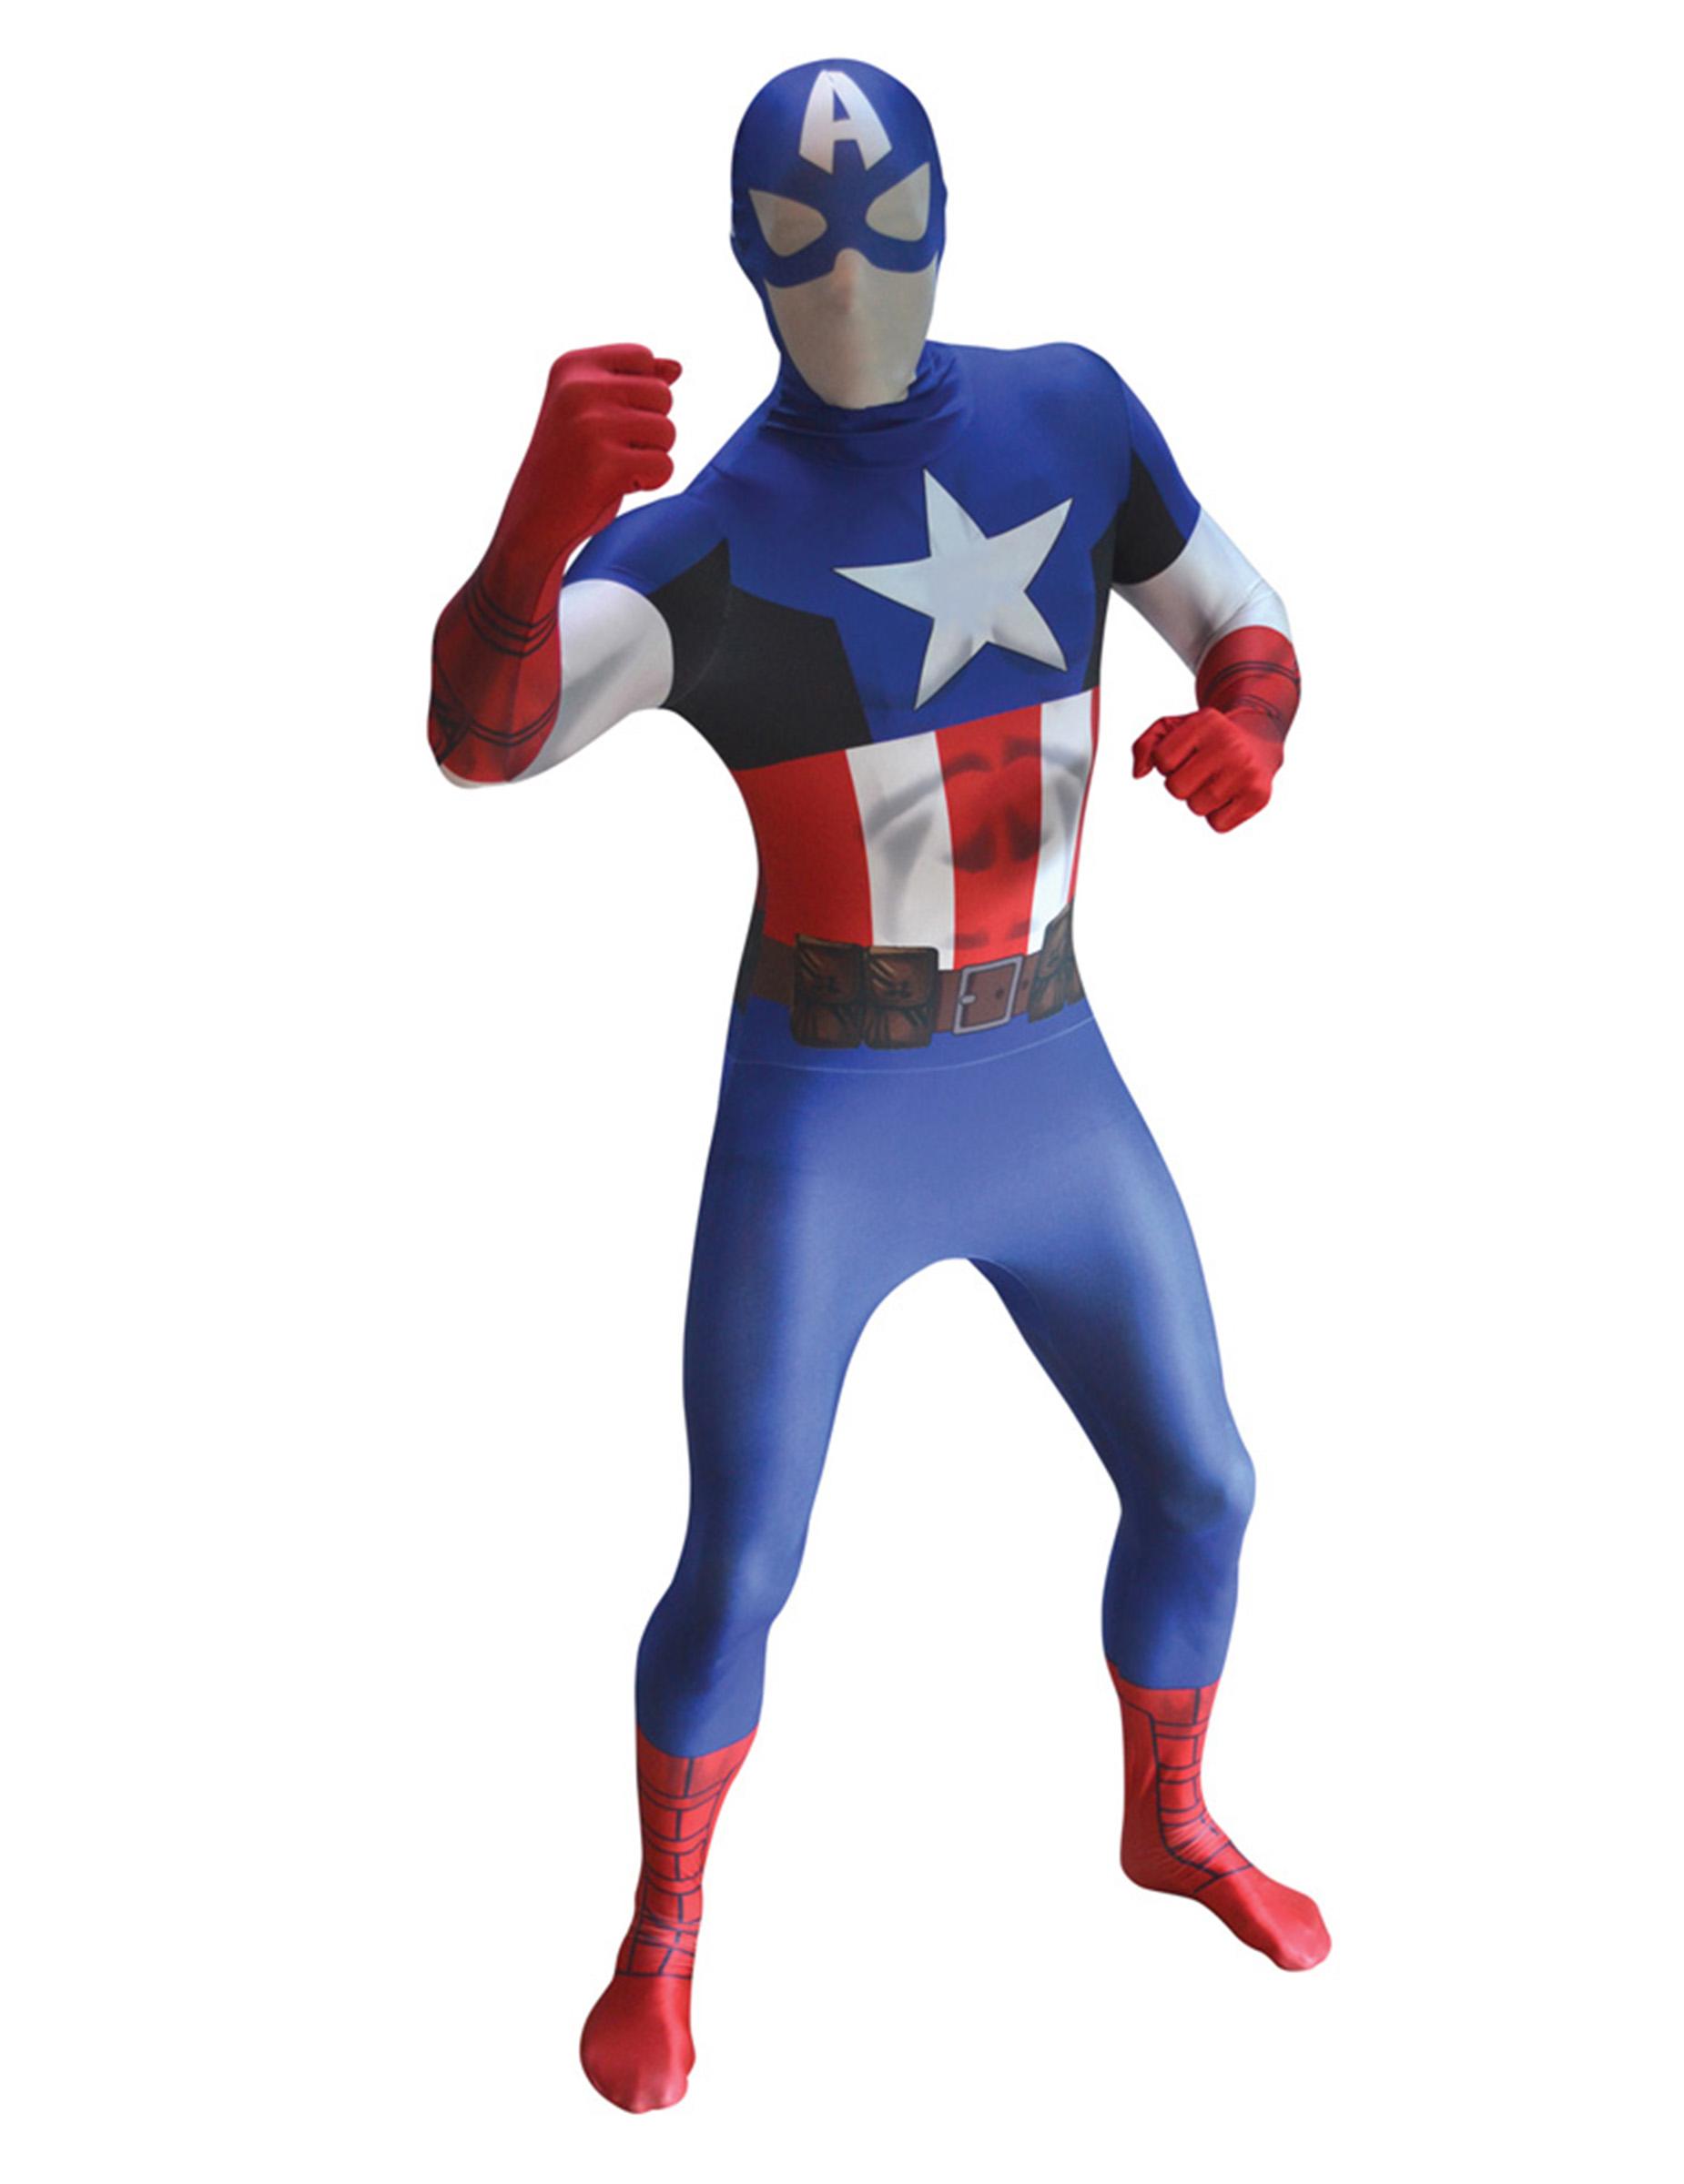 hautenges captain america kost m f r erwachsene kost me. Black Bedroom Furniture Sets. Home Design Ideas